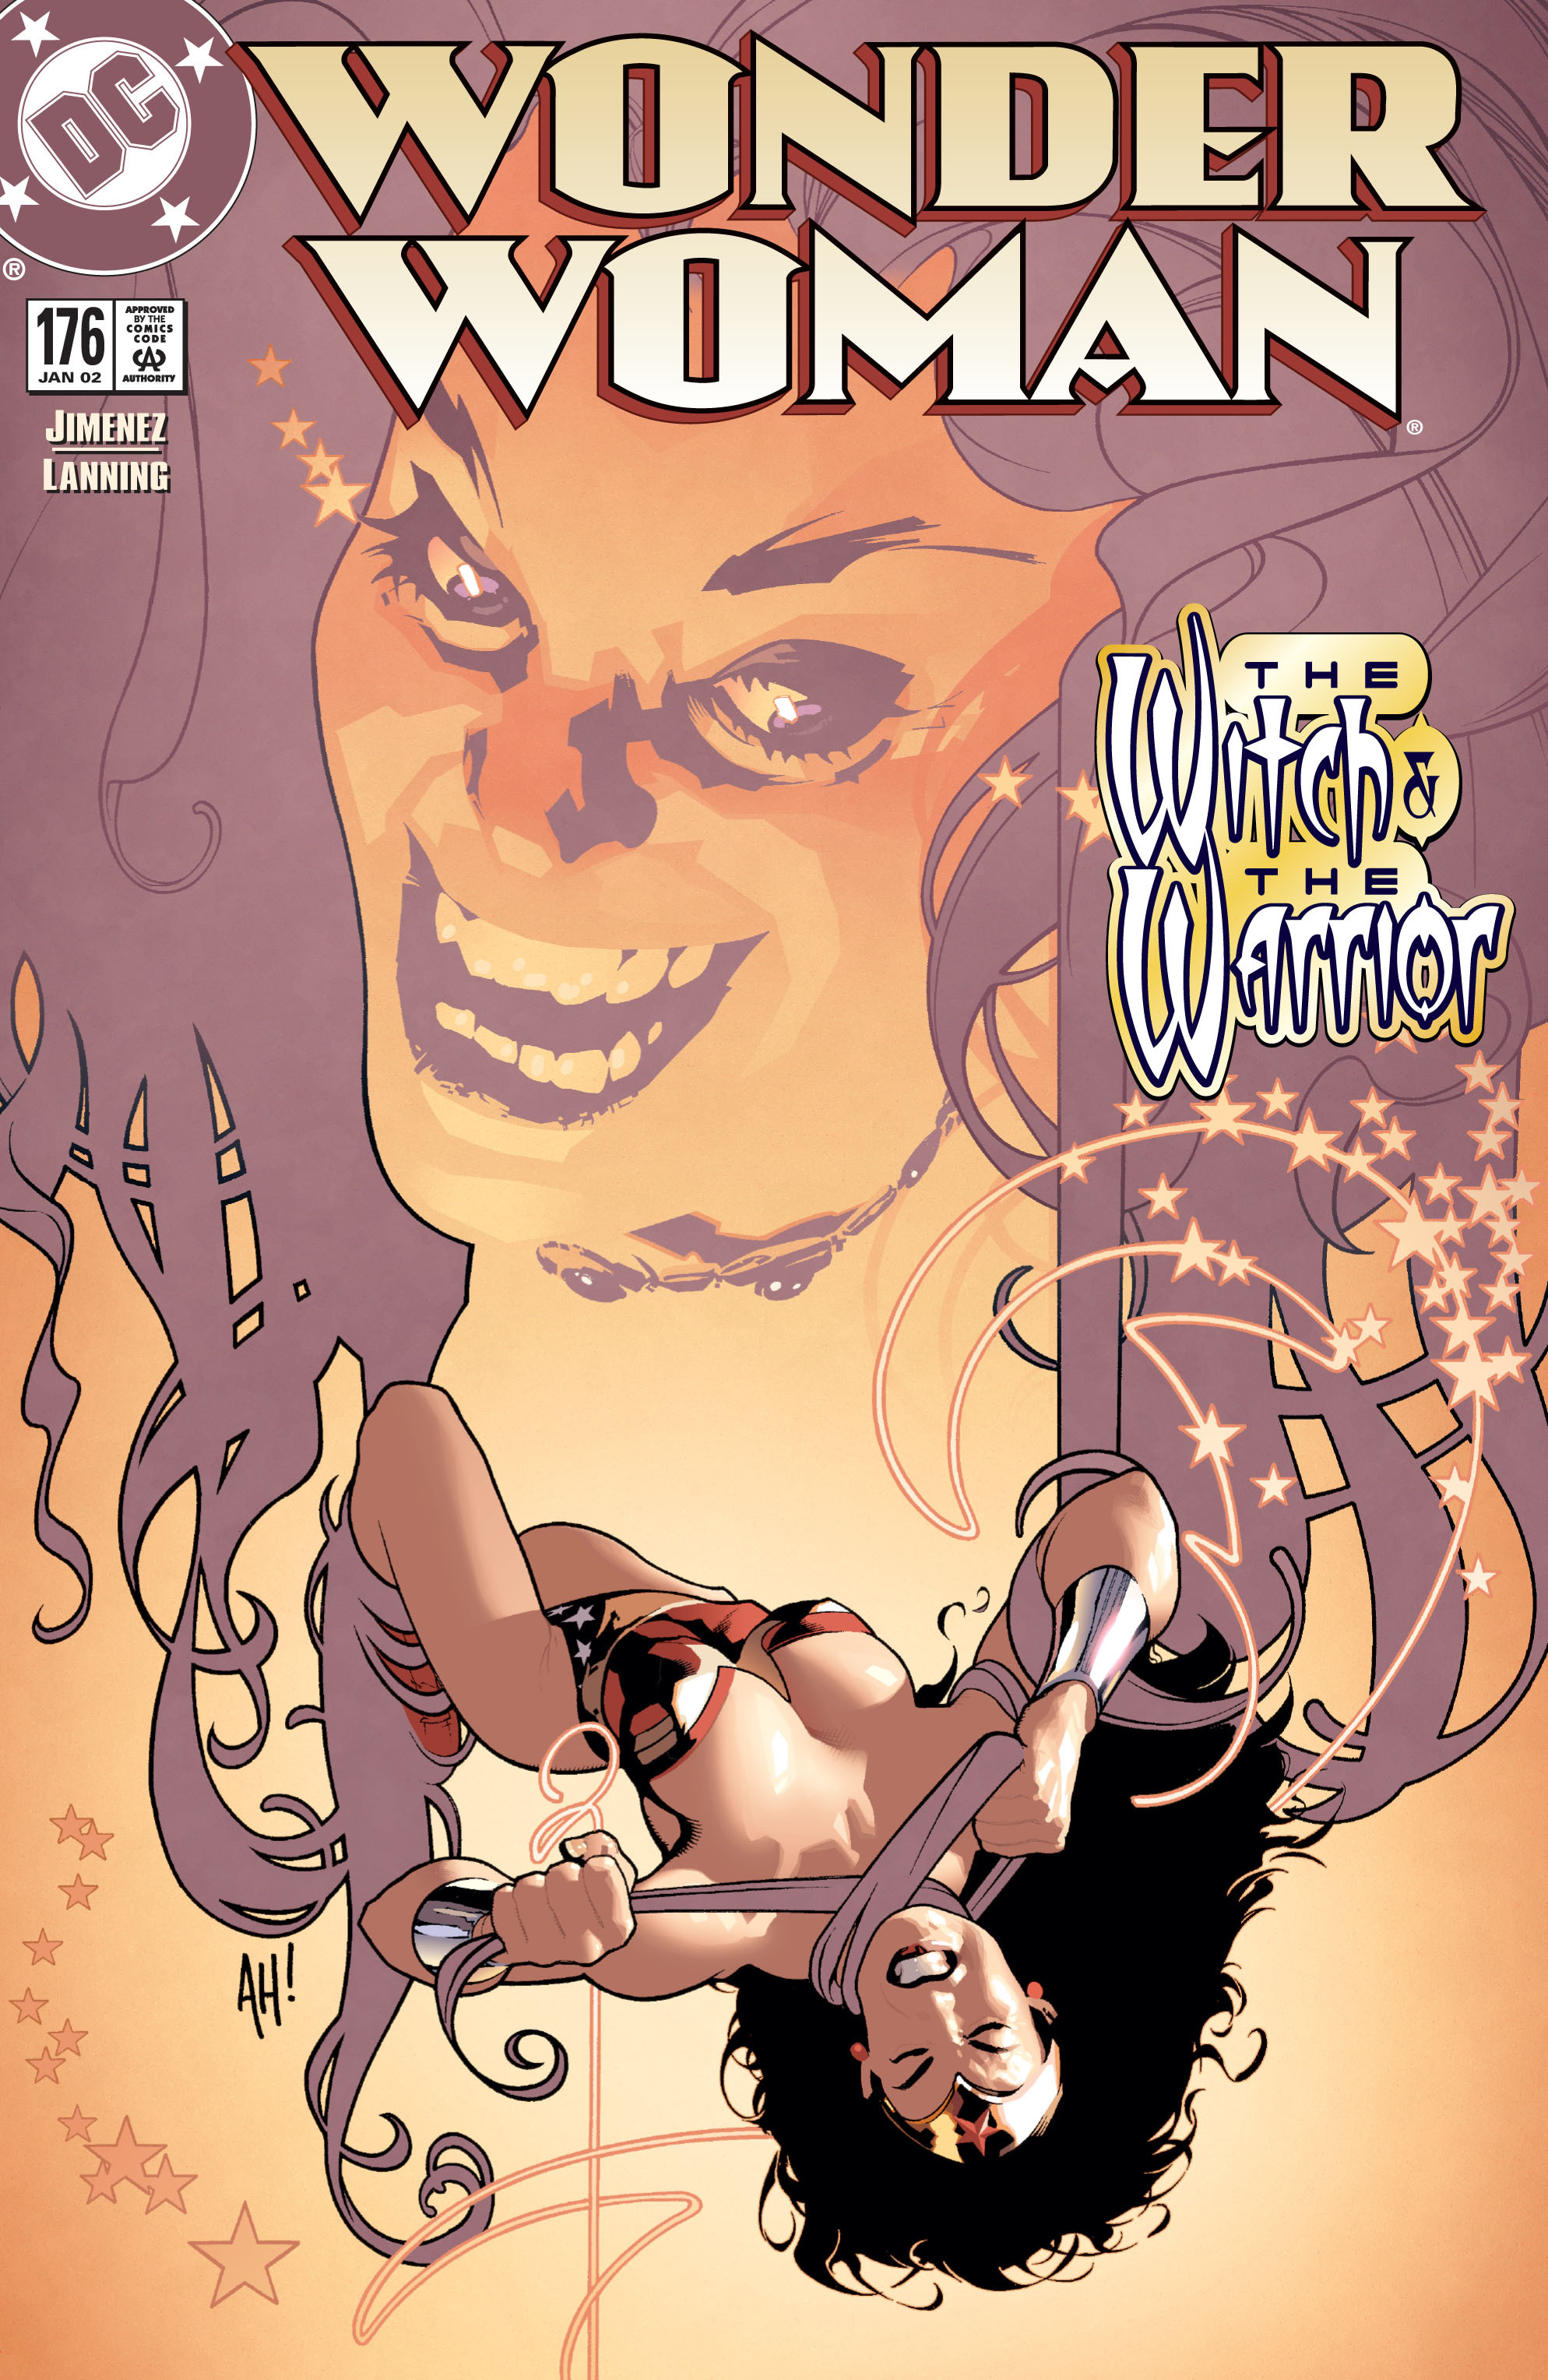 Read online Wonder Woman (1987) comic -  Issue #176 - 1